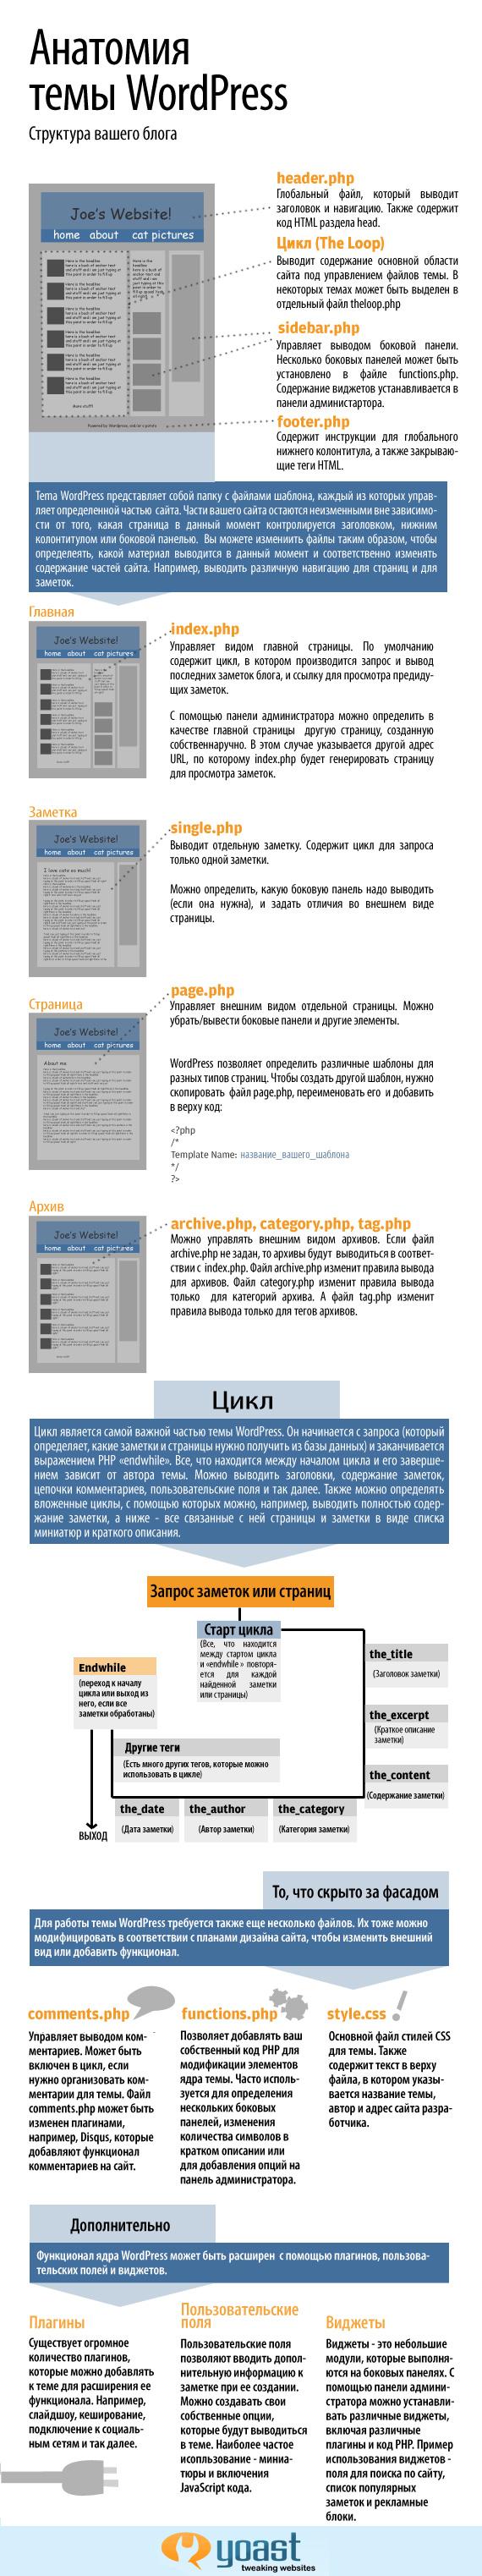 Анатомия темы WordPress